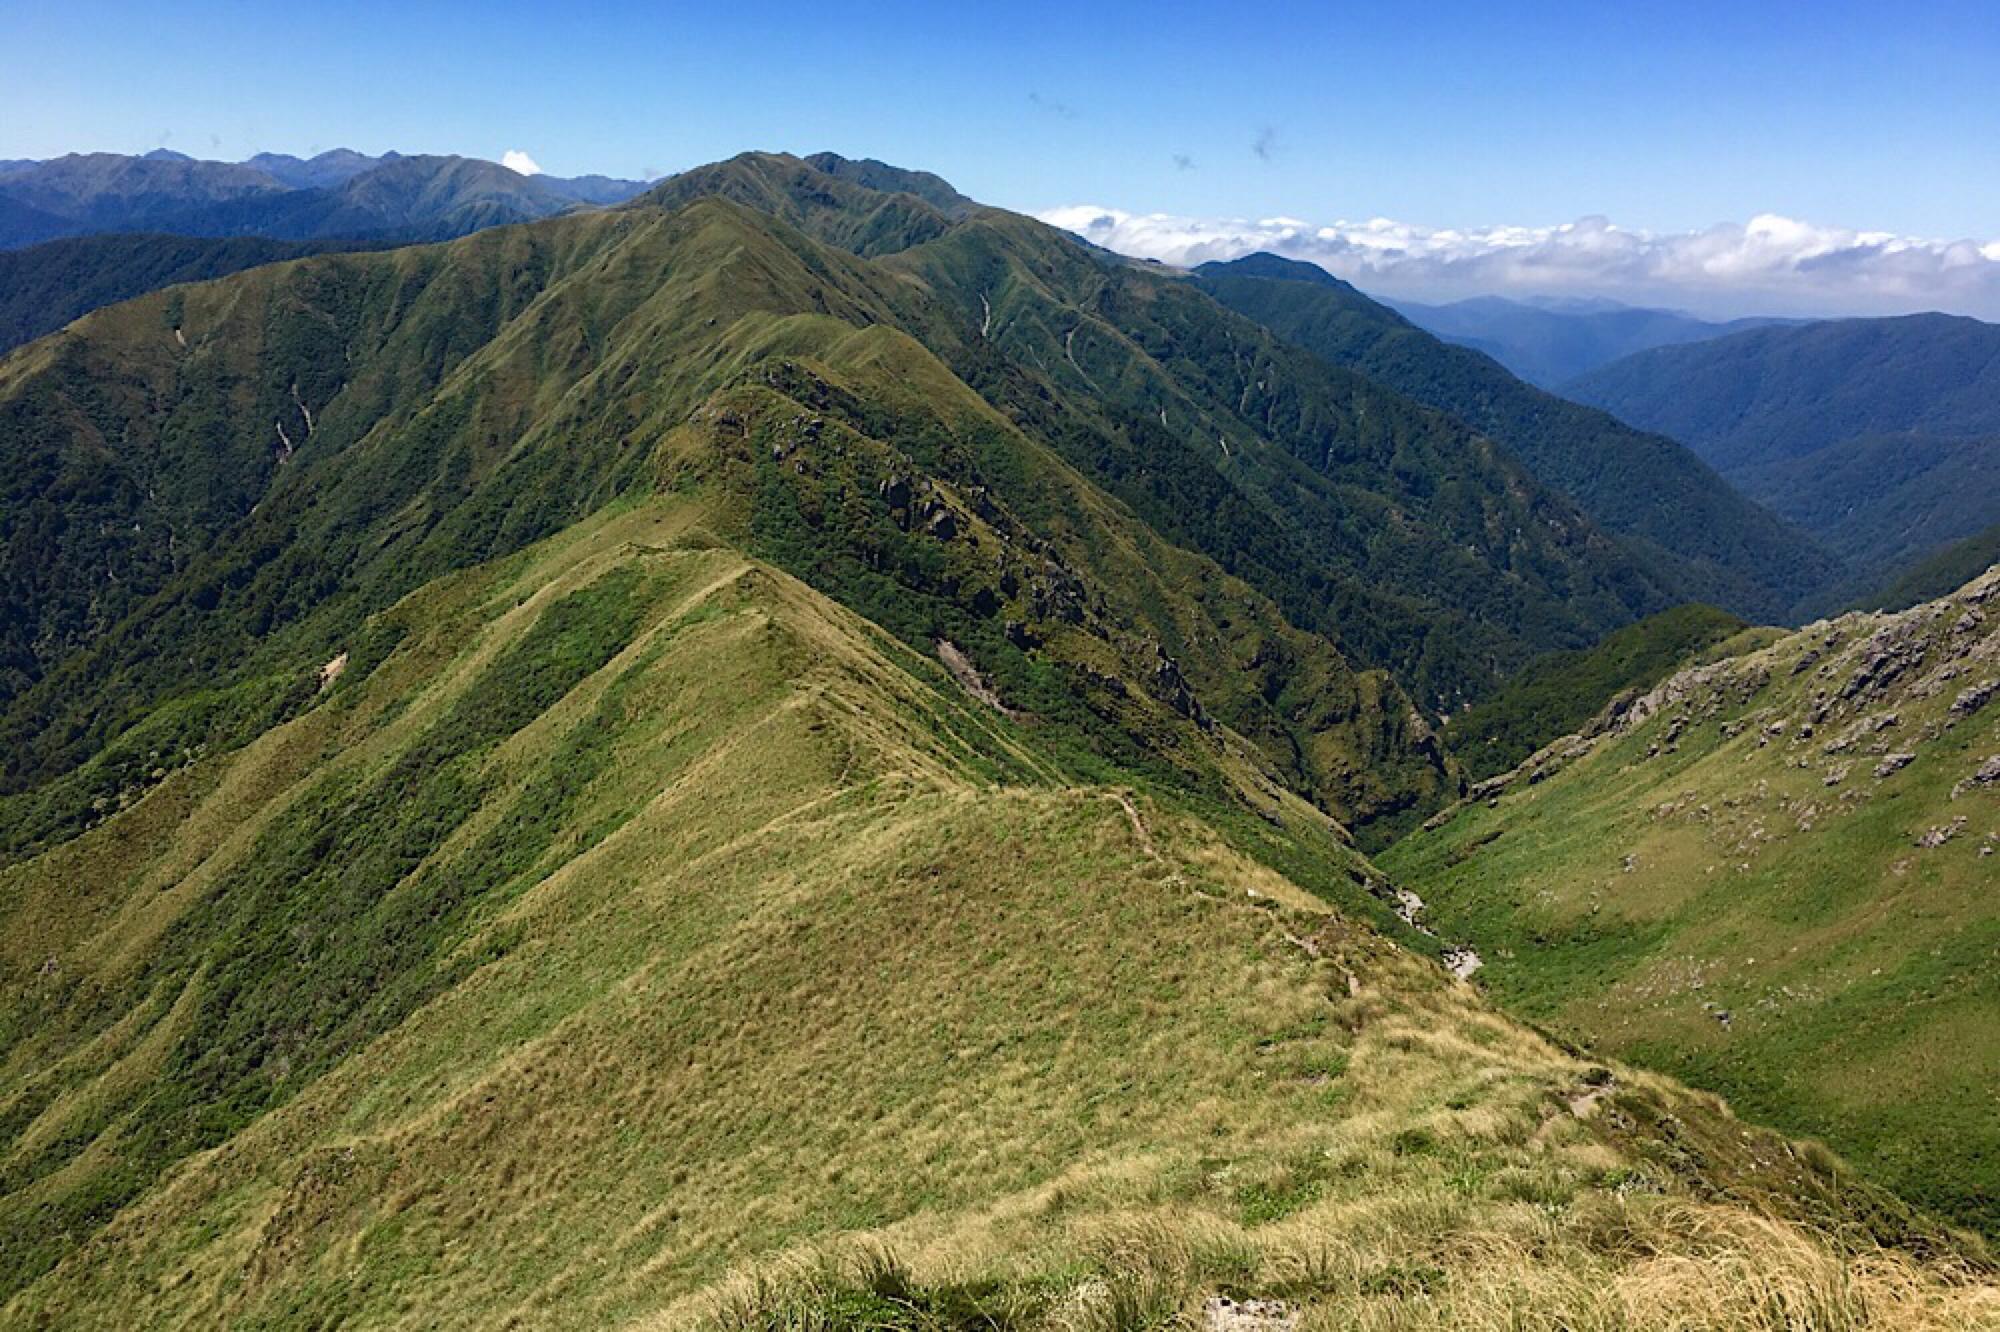 Tramping the Tararua Peaks - Part 2: New Zealand Felicity Macintosh